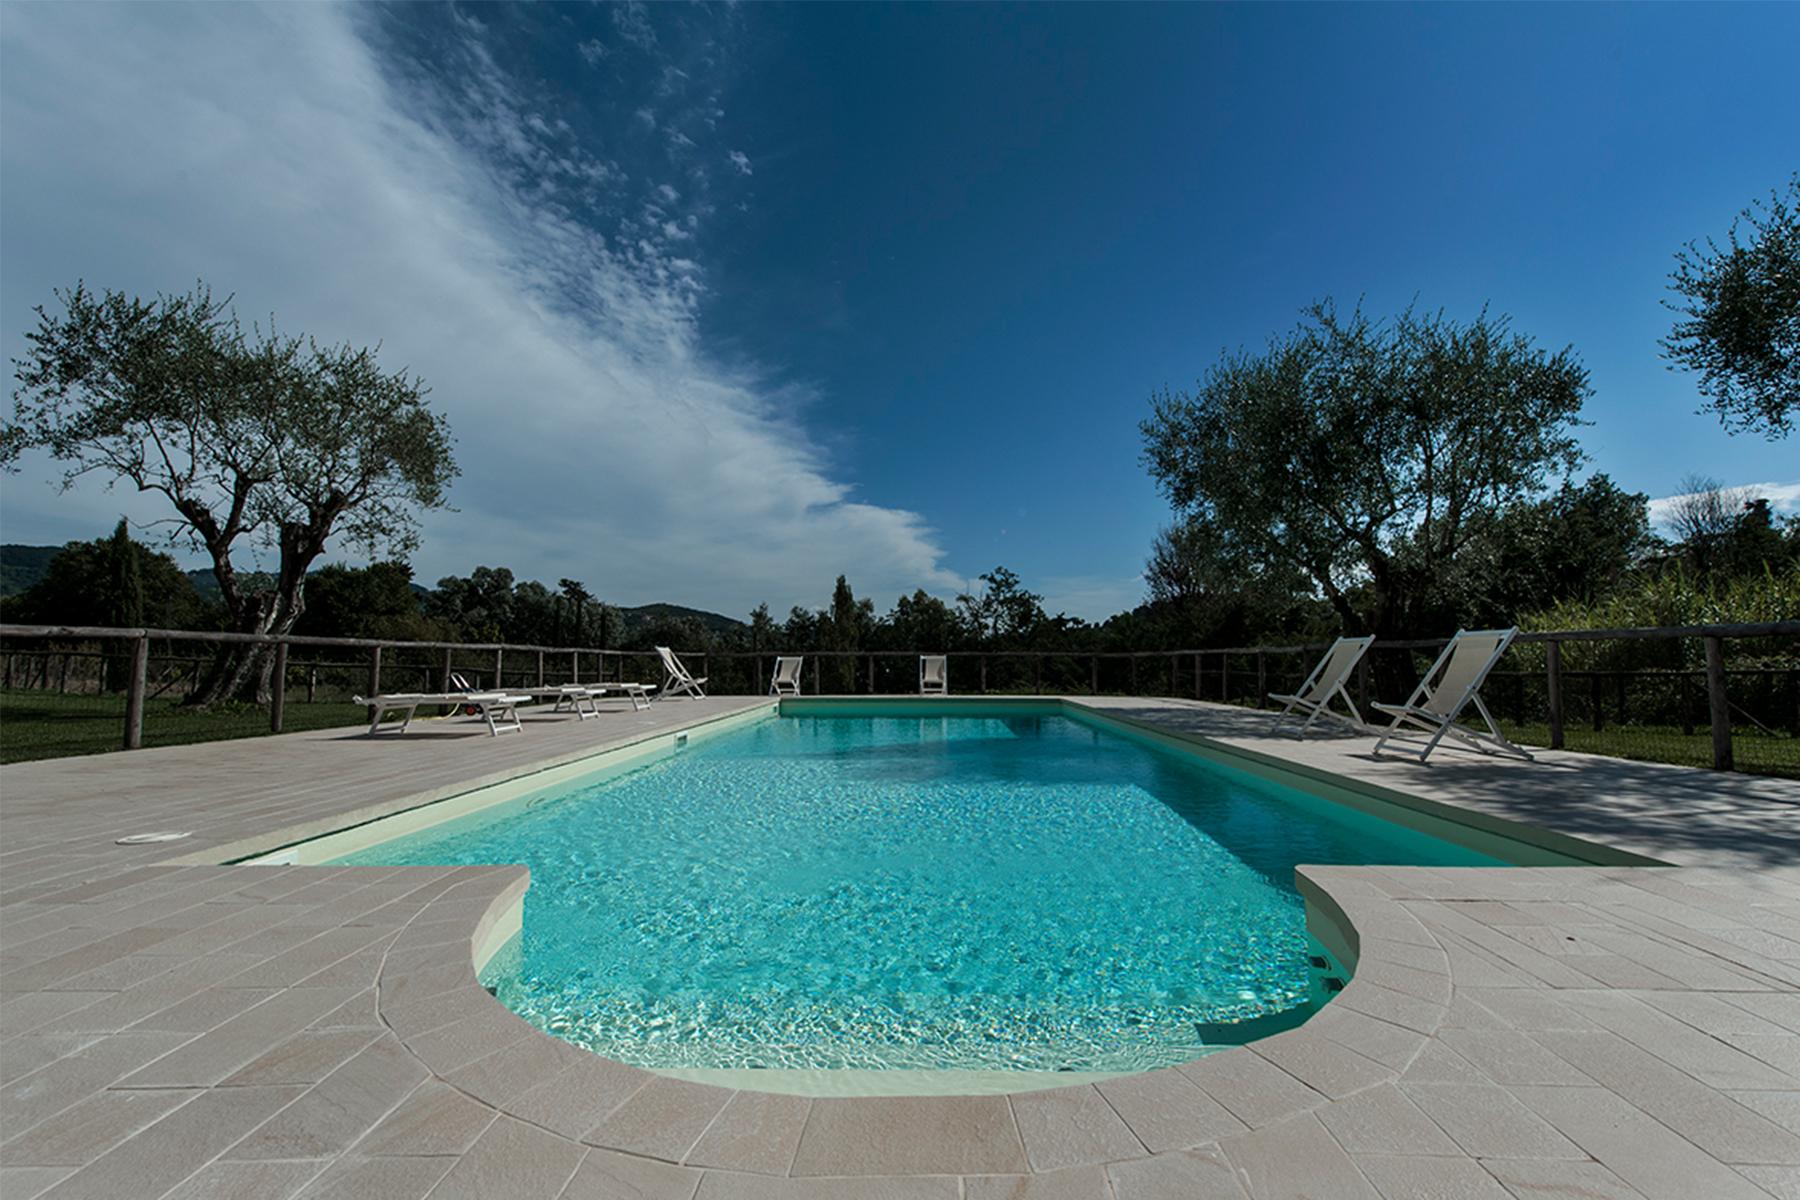 Casa indipendente in Vendita a Massarosa: 5 locali, 350 mq - Foto 5